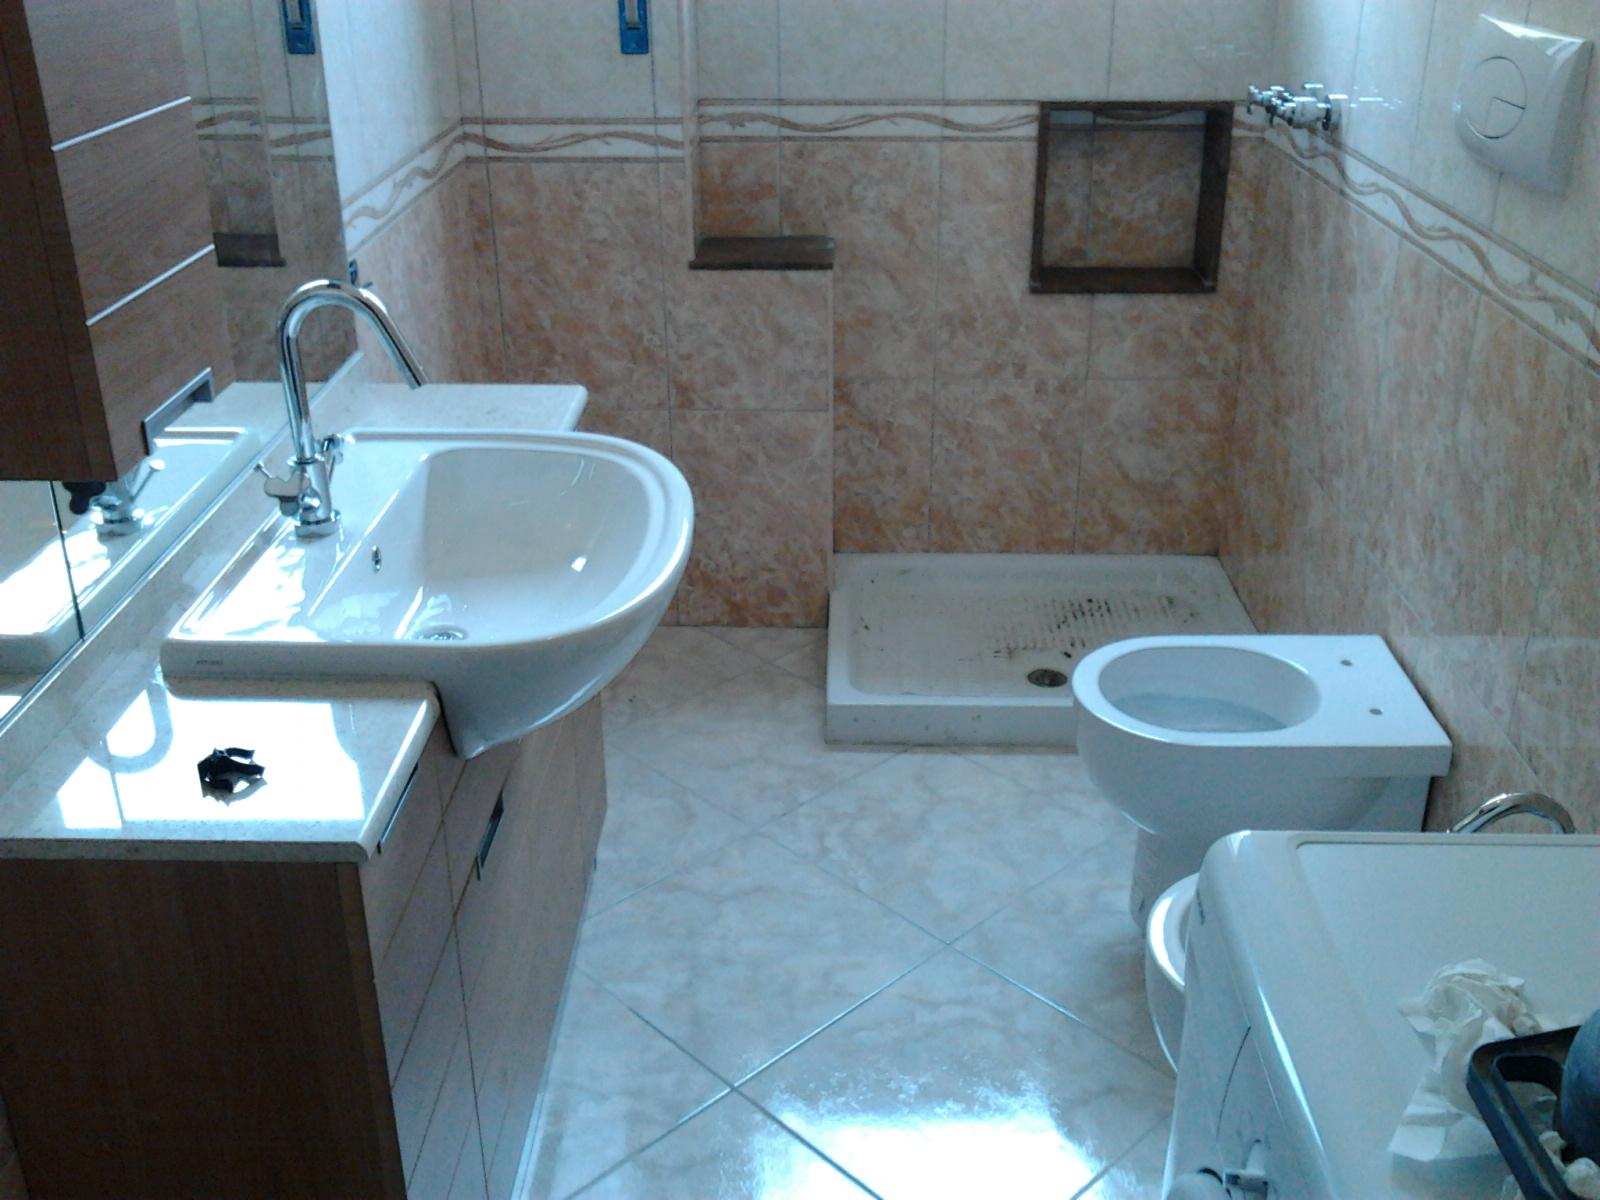 Il Blog dellidraulico: sanitario bagno